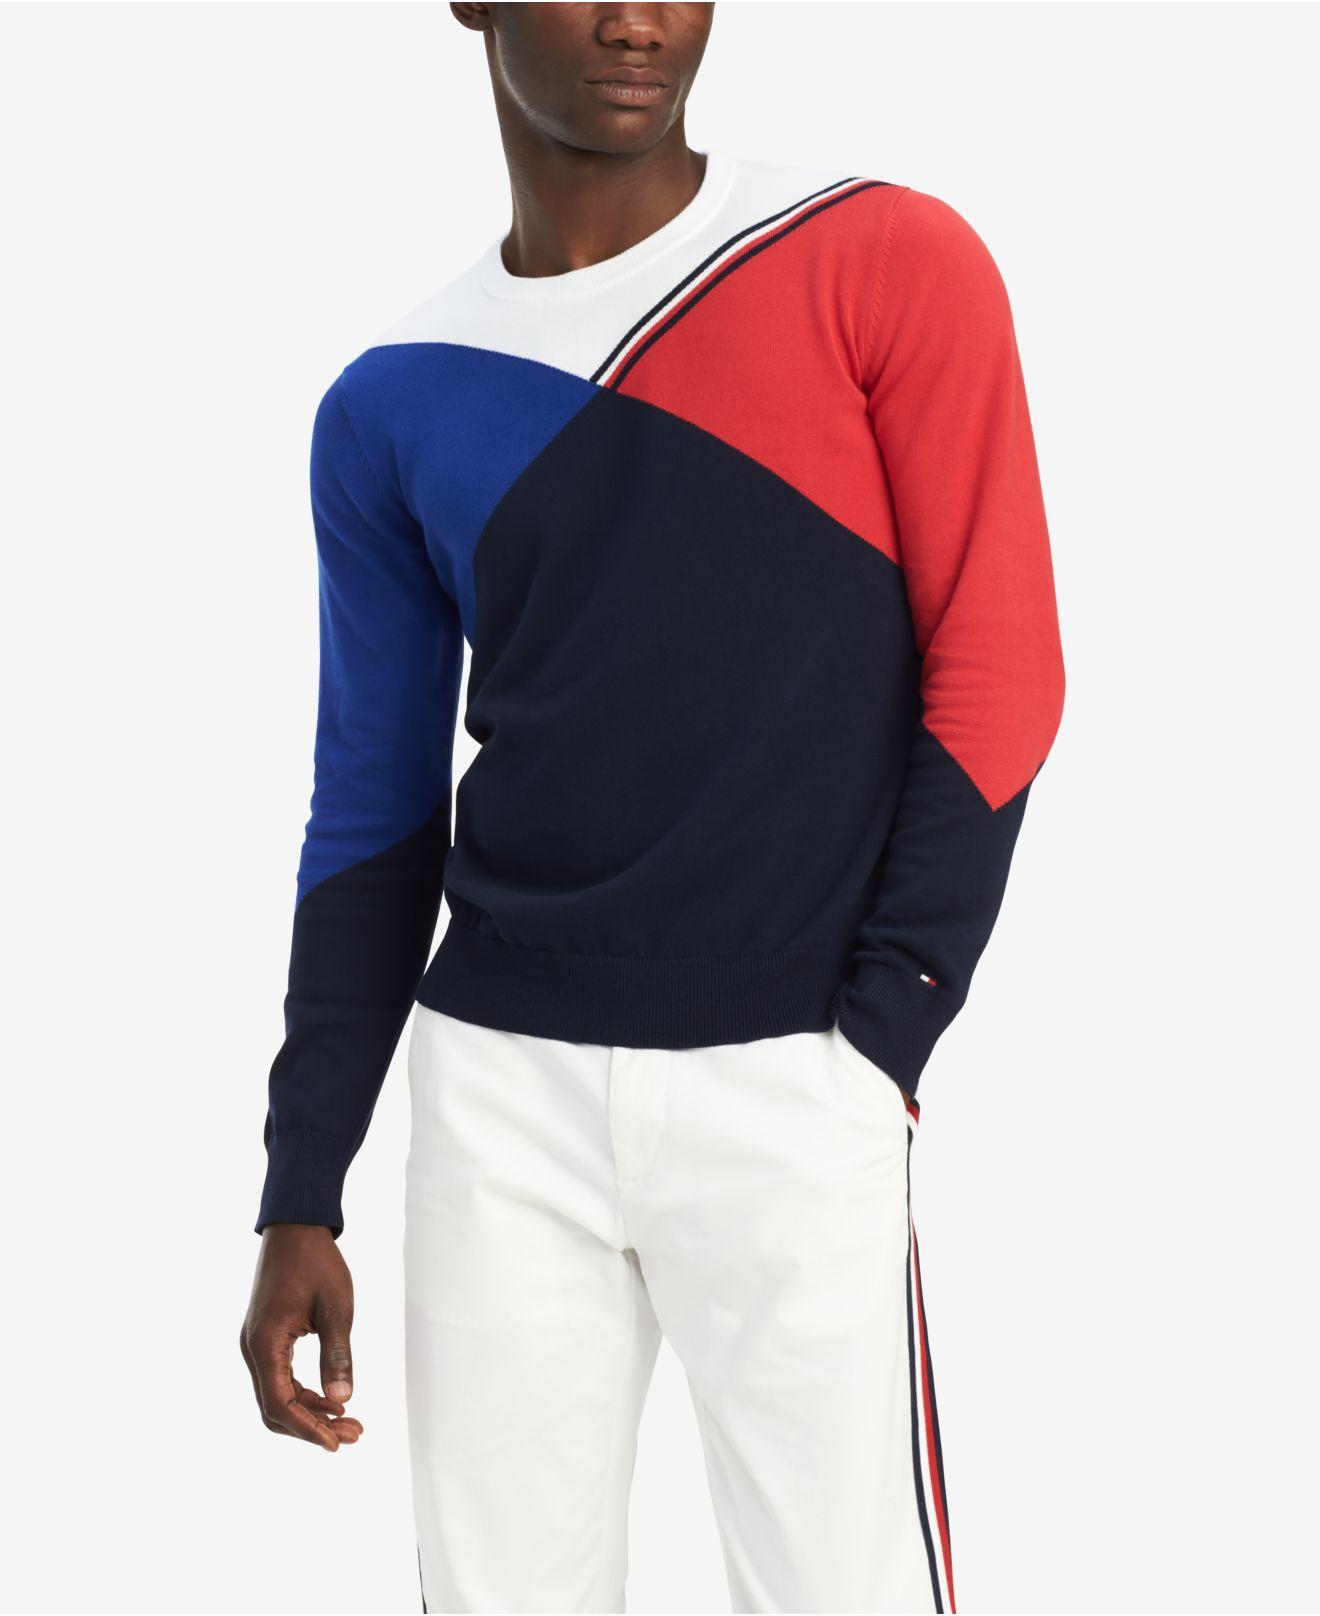 07b96834928d54 Tommy Hilfiger. Men s Blue Bobby Sweatshirt